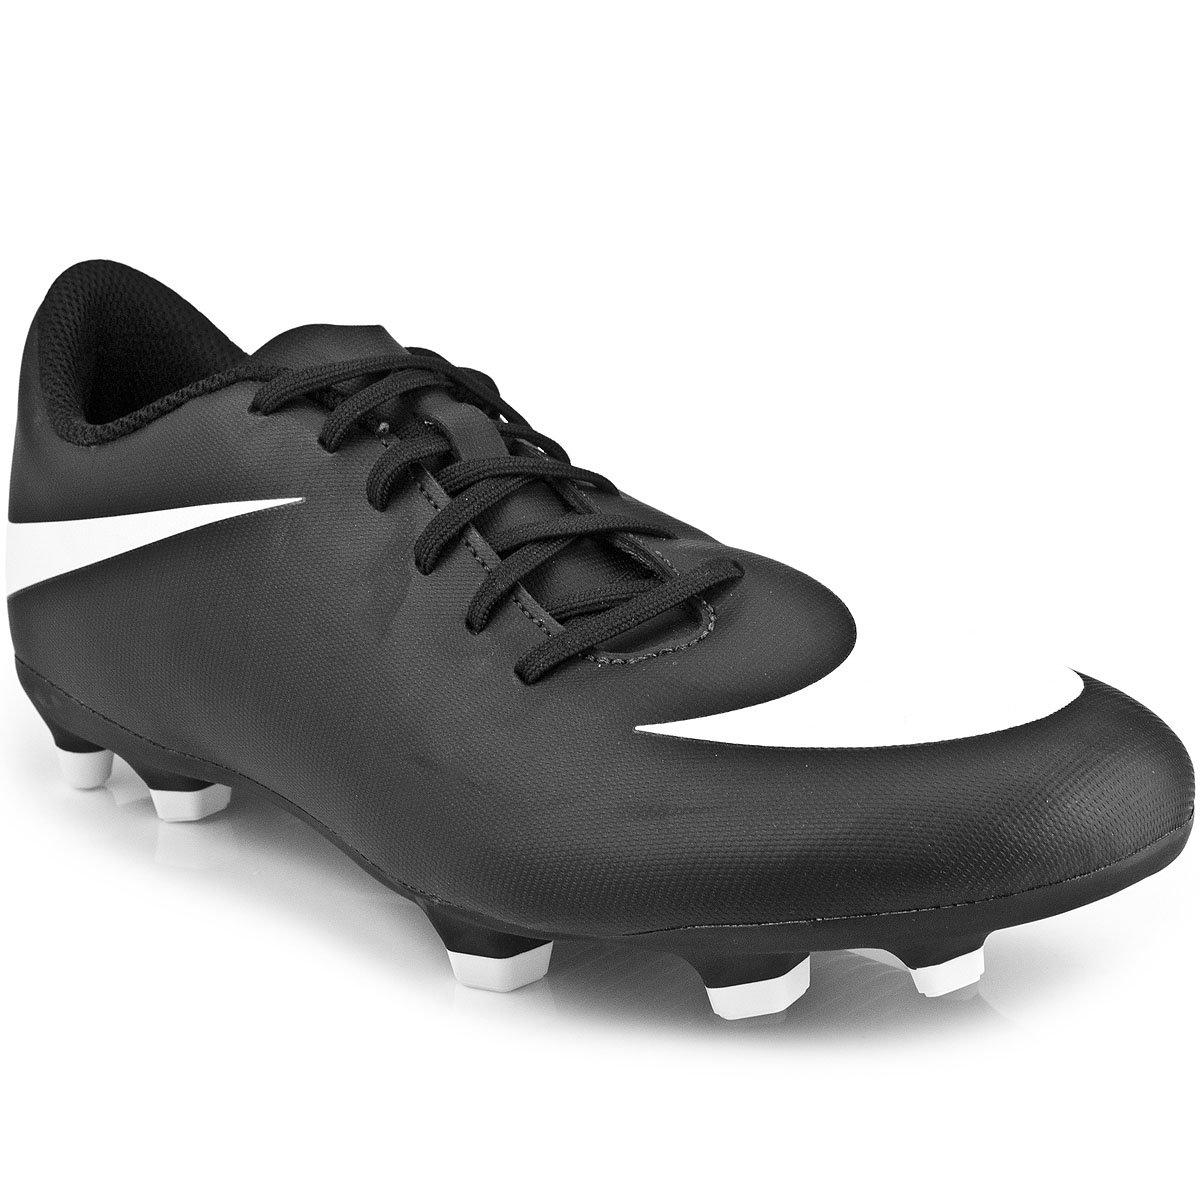 61bcfc468ba7c Chuteira Nike Bravata II FG 844436